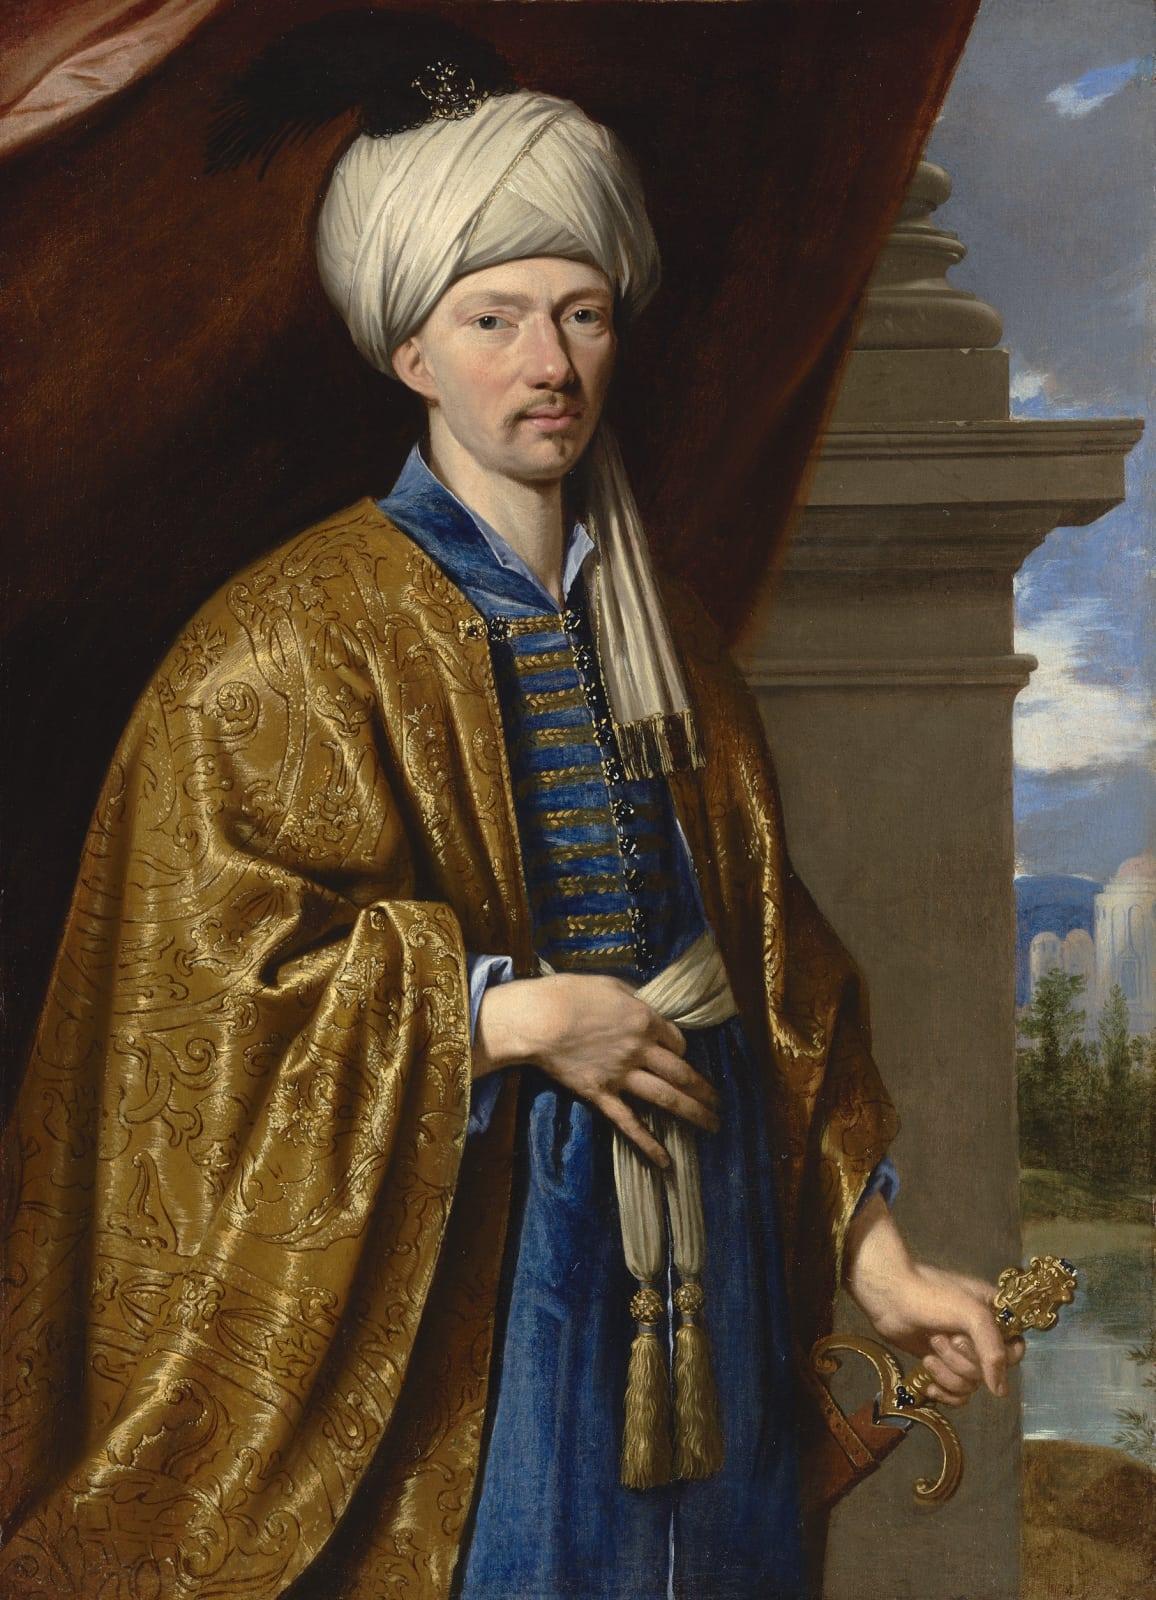 Jean de Thévenot (1633 - 1667)